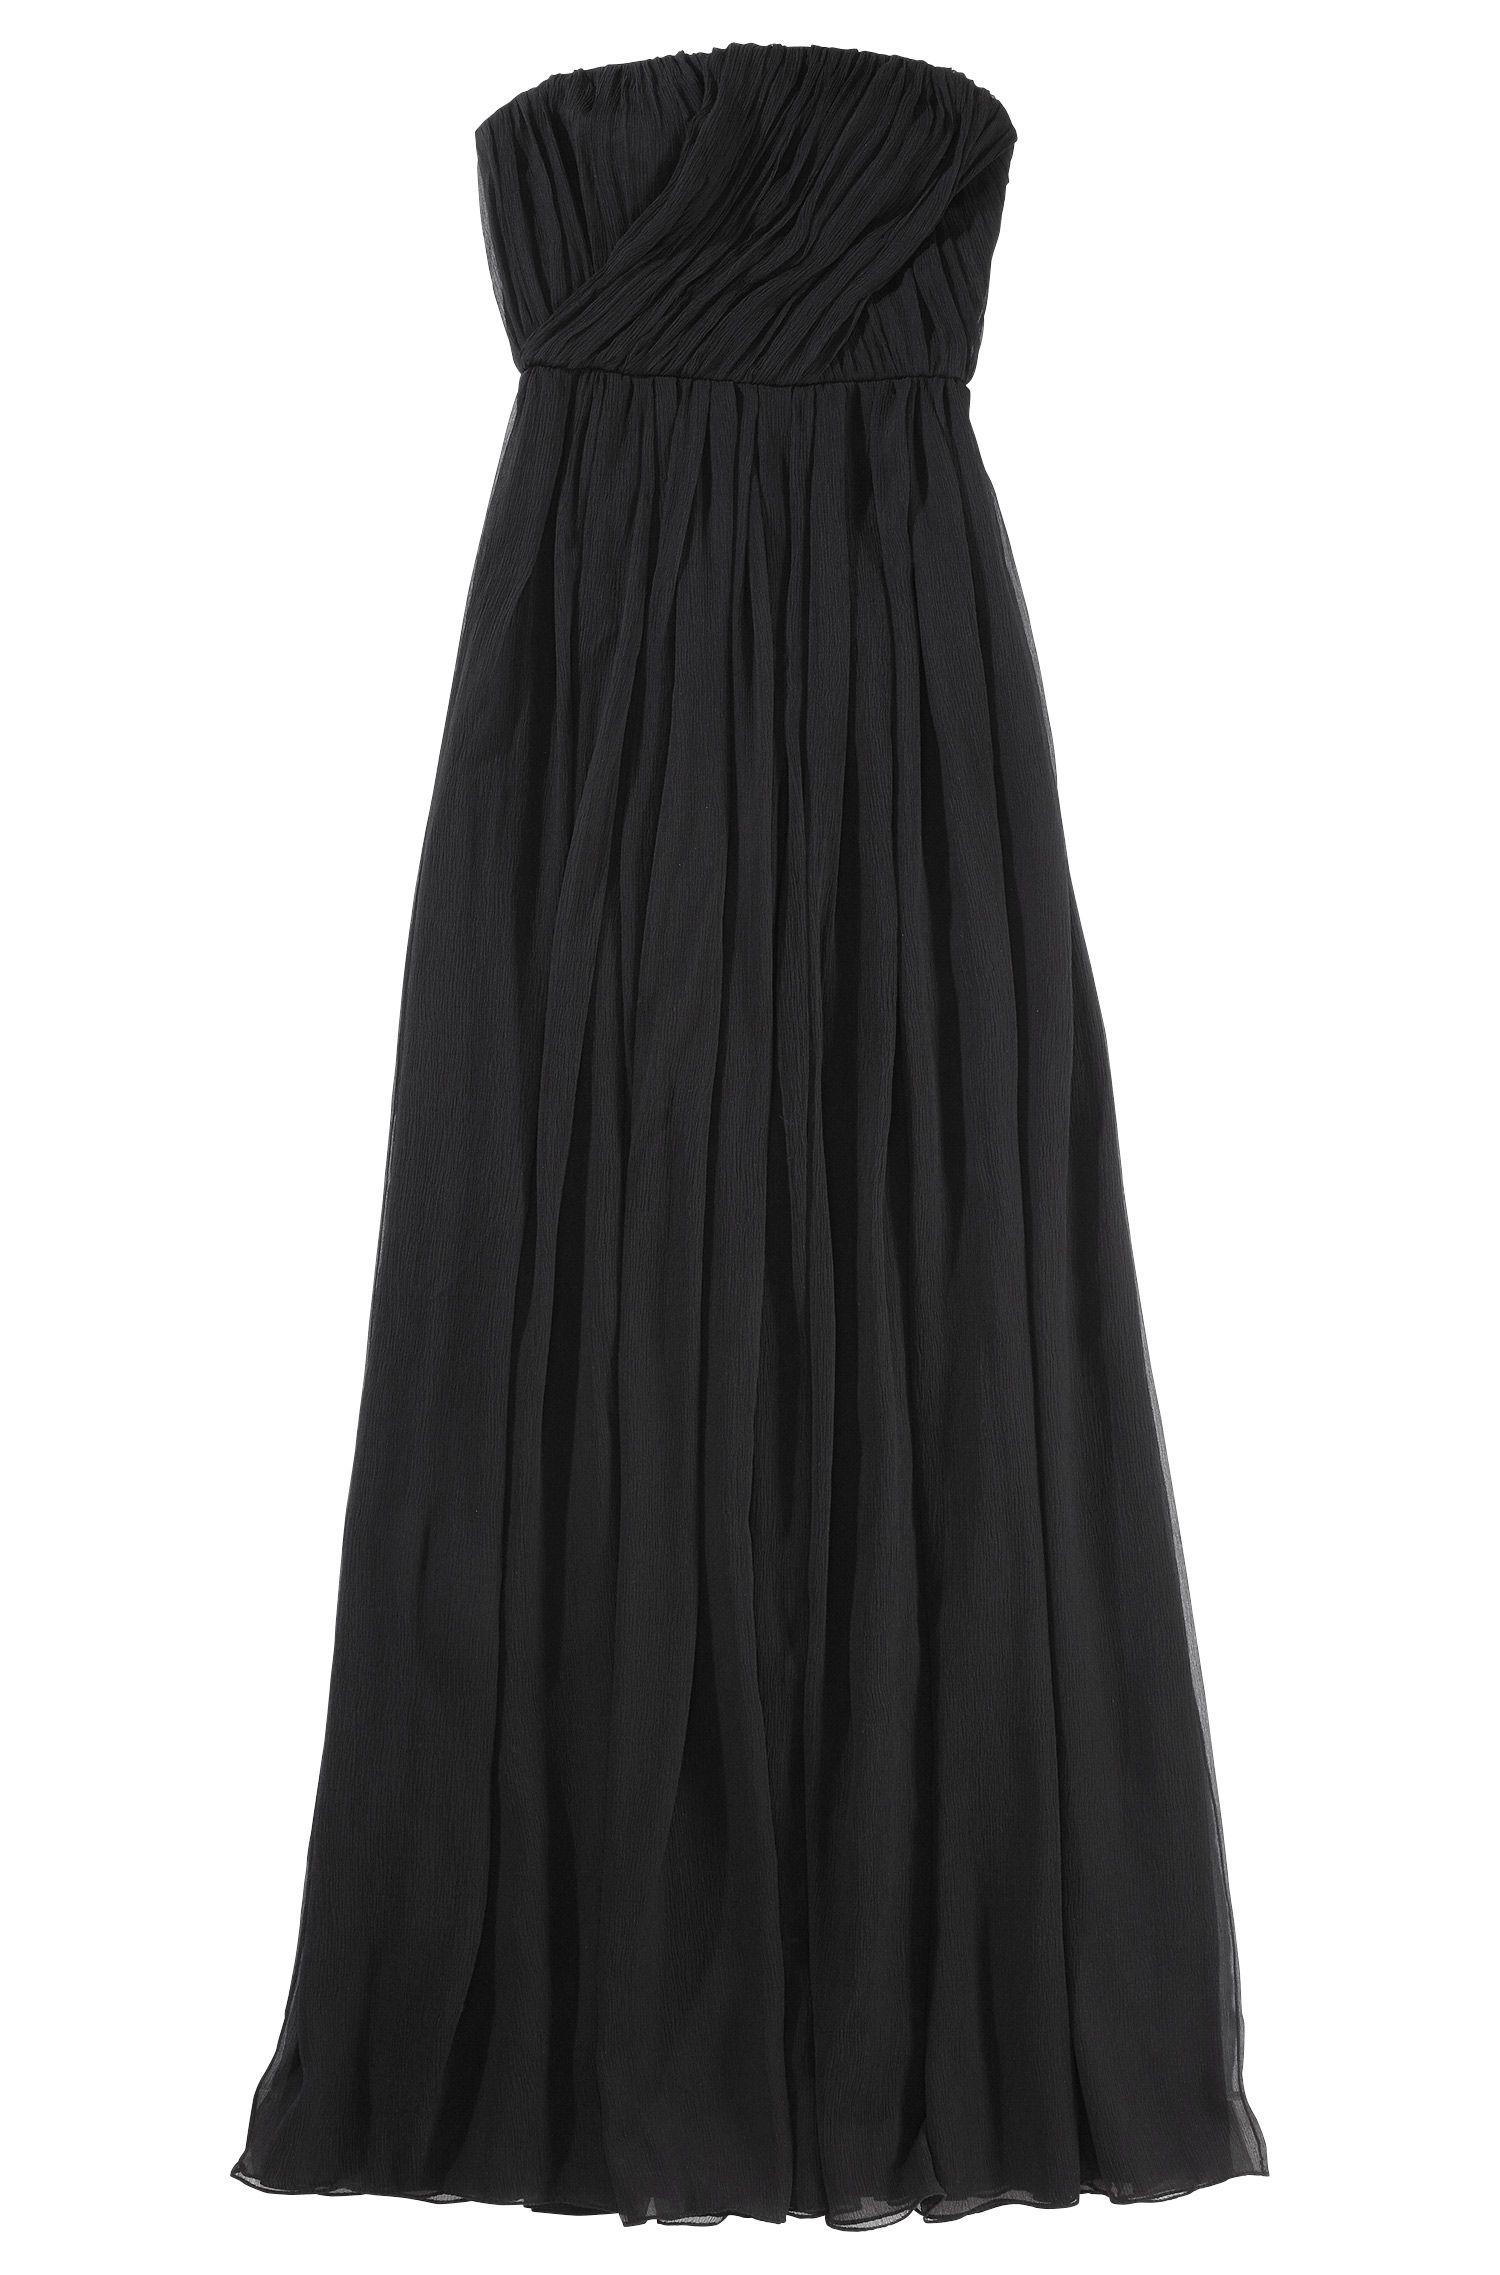 Abendkleid ´Dianela` aus feinstem Seidenkrepp